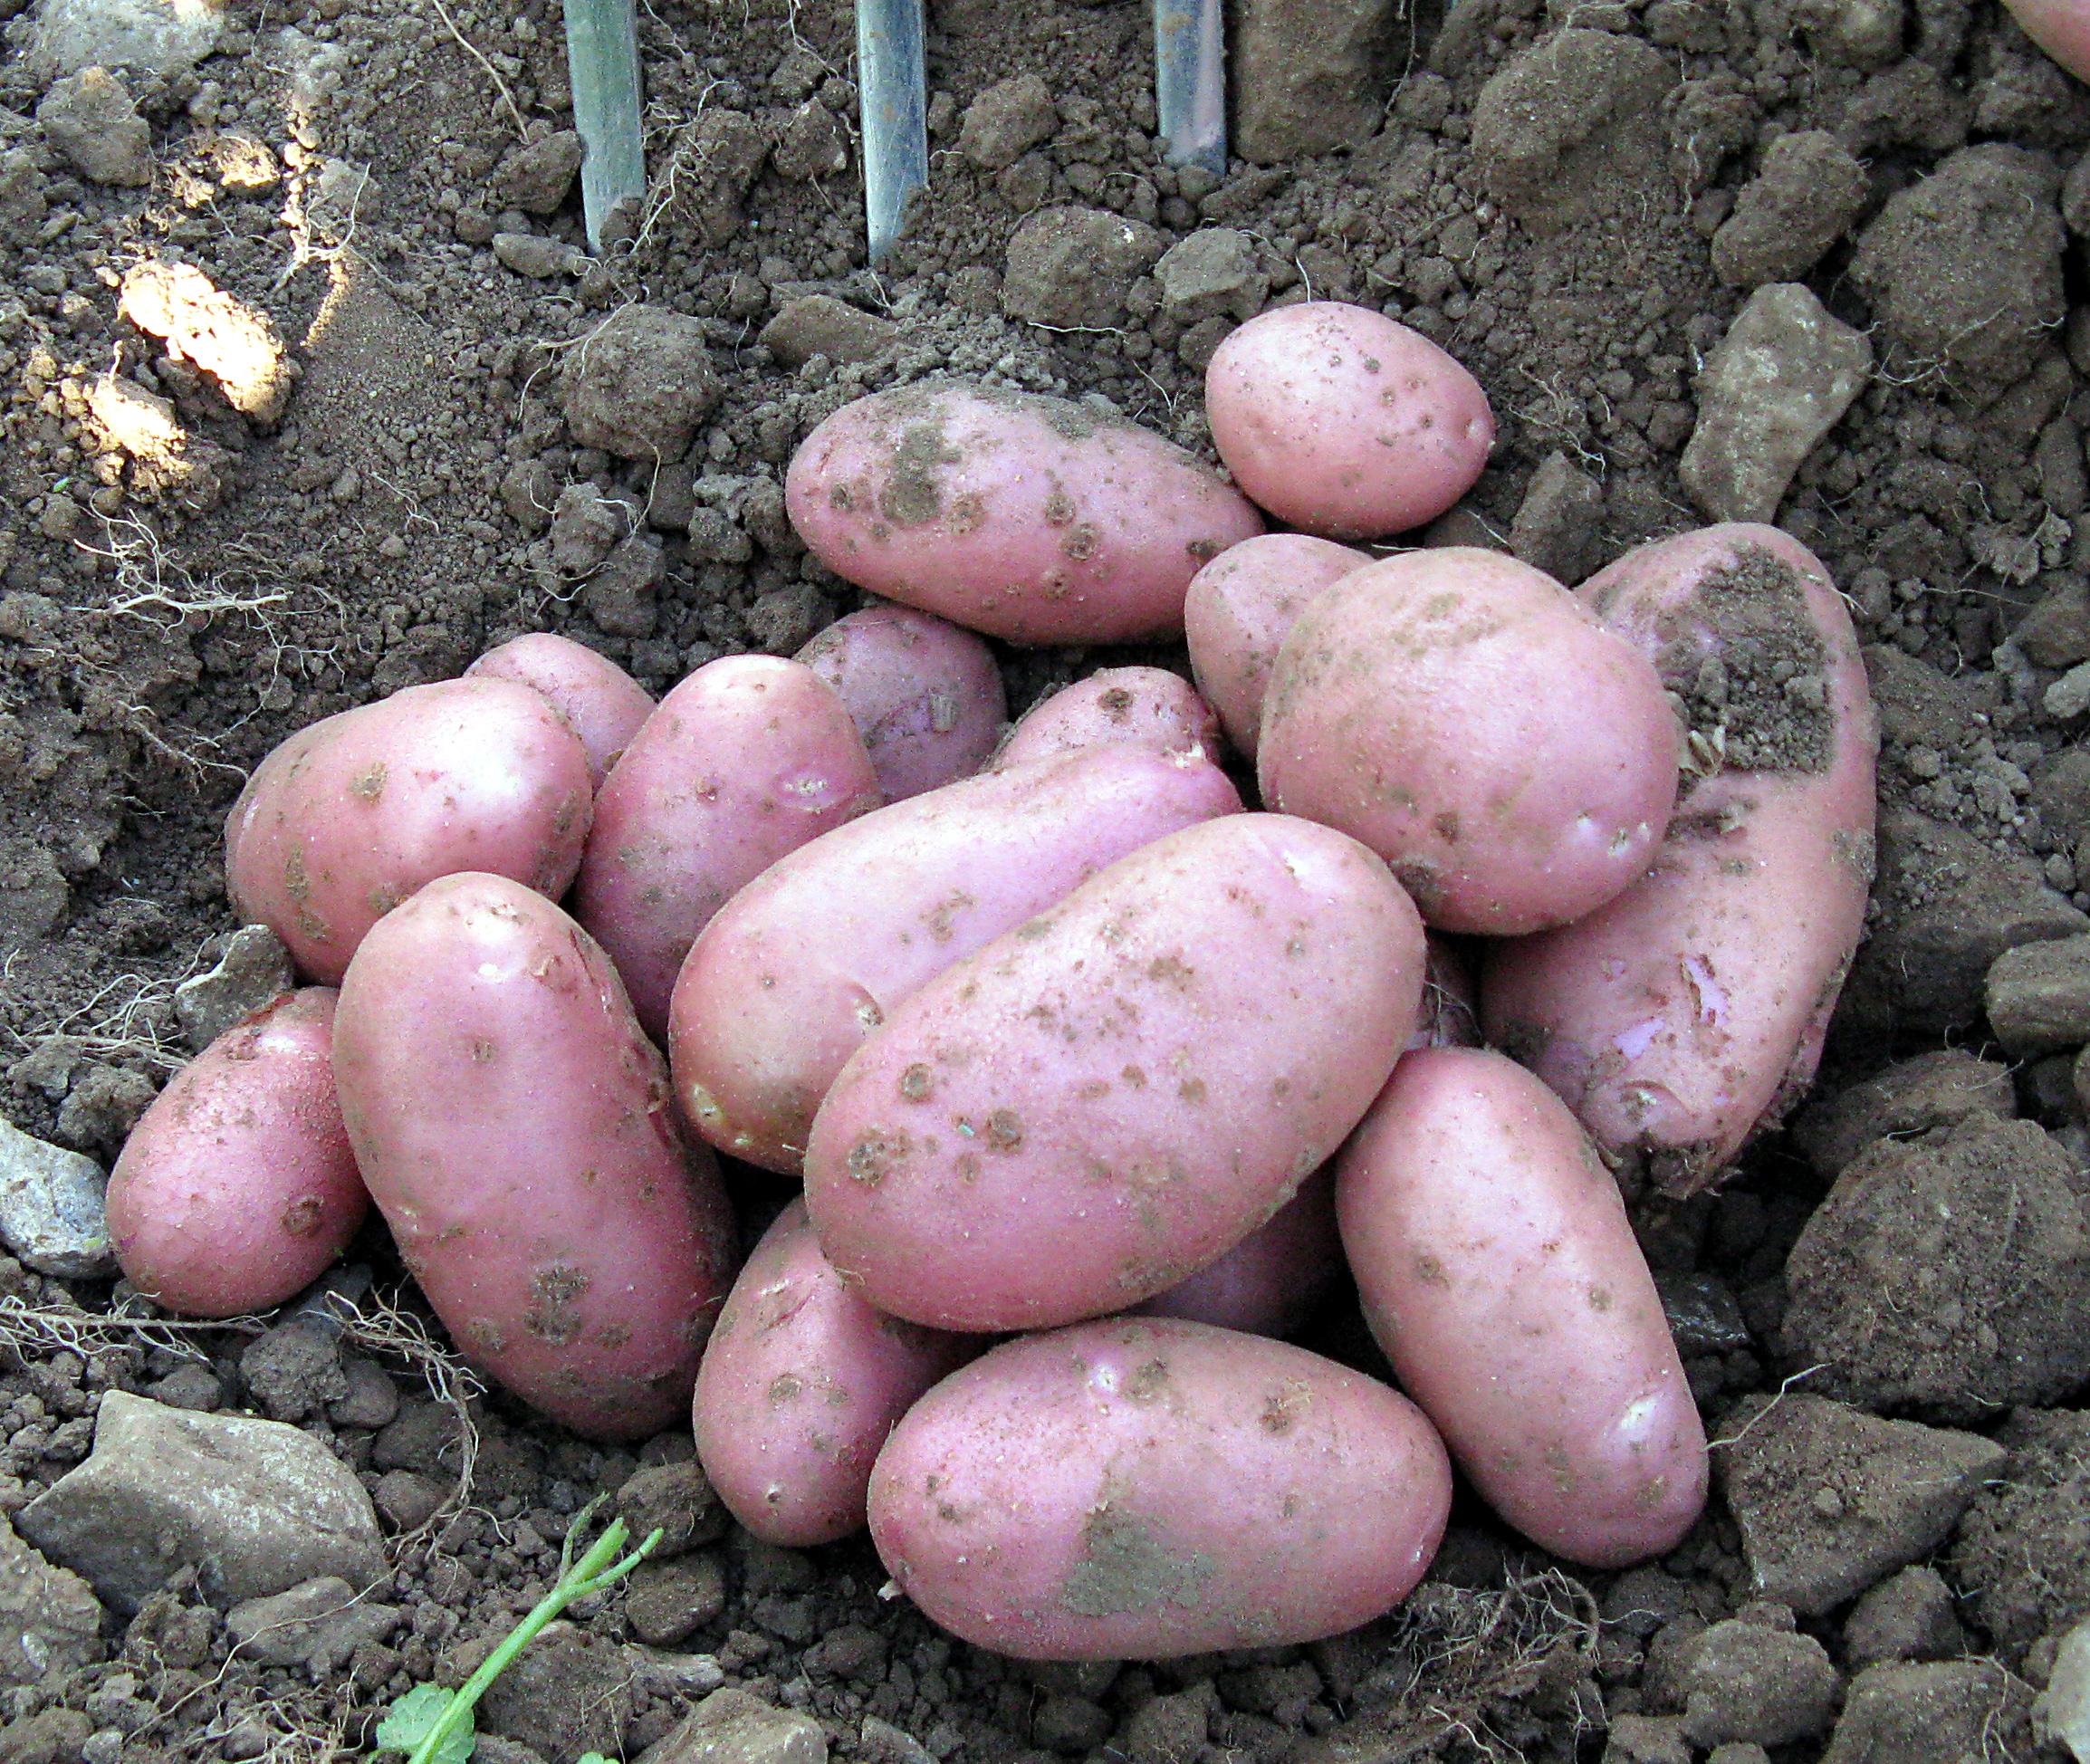 Сорт картофеля елизавета: характеристика, описание и фото картошки, а также выращивание и уход